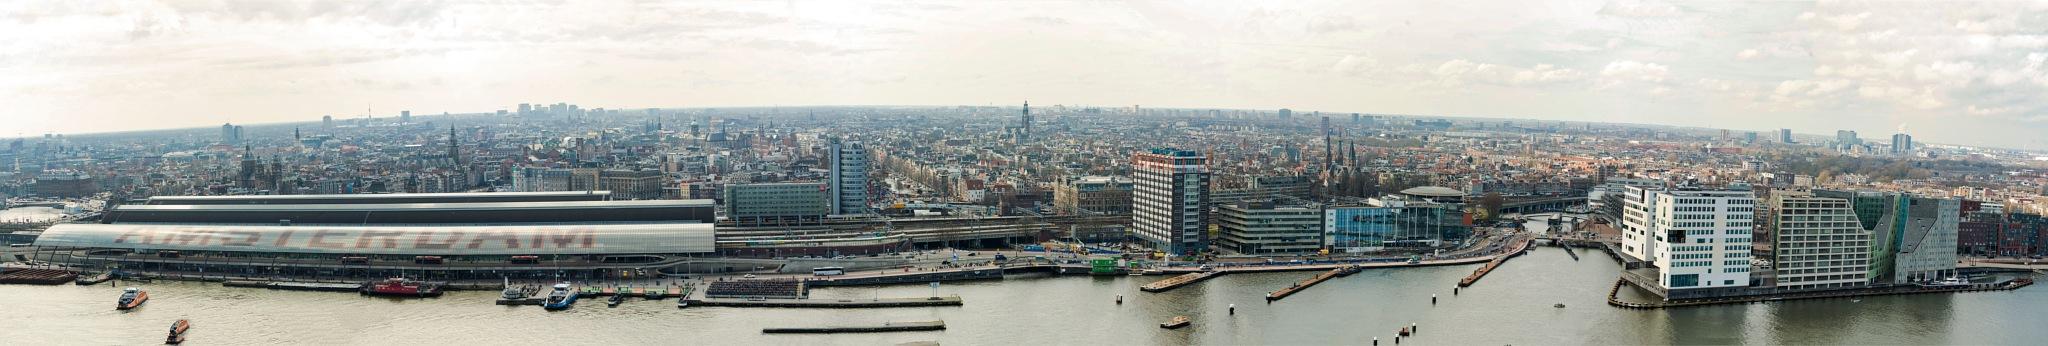 Amsterdam Panorama (2) by harald.seiwert